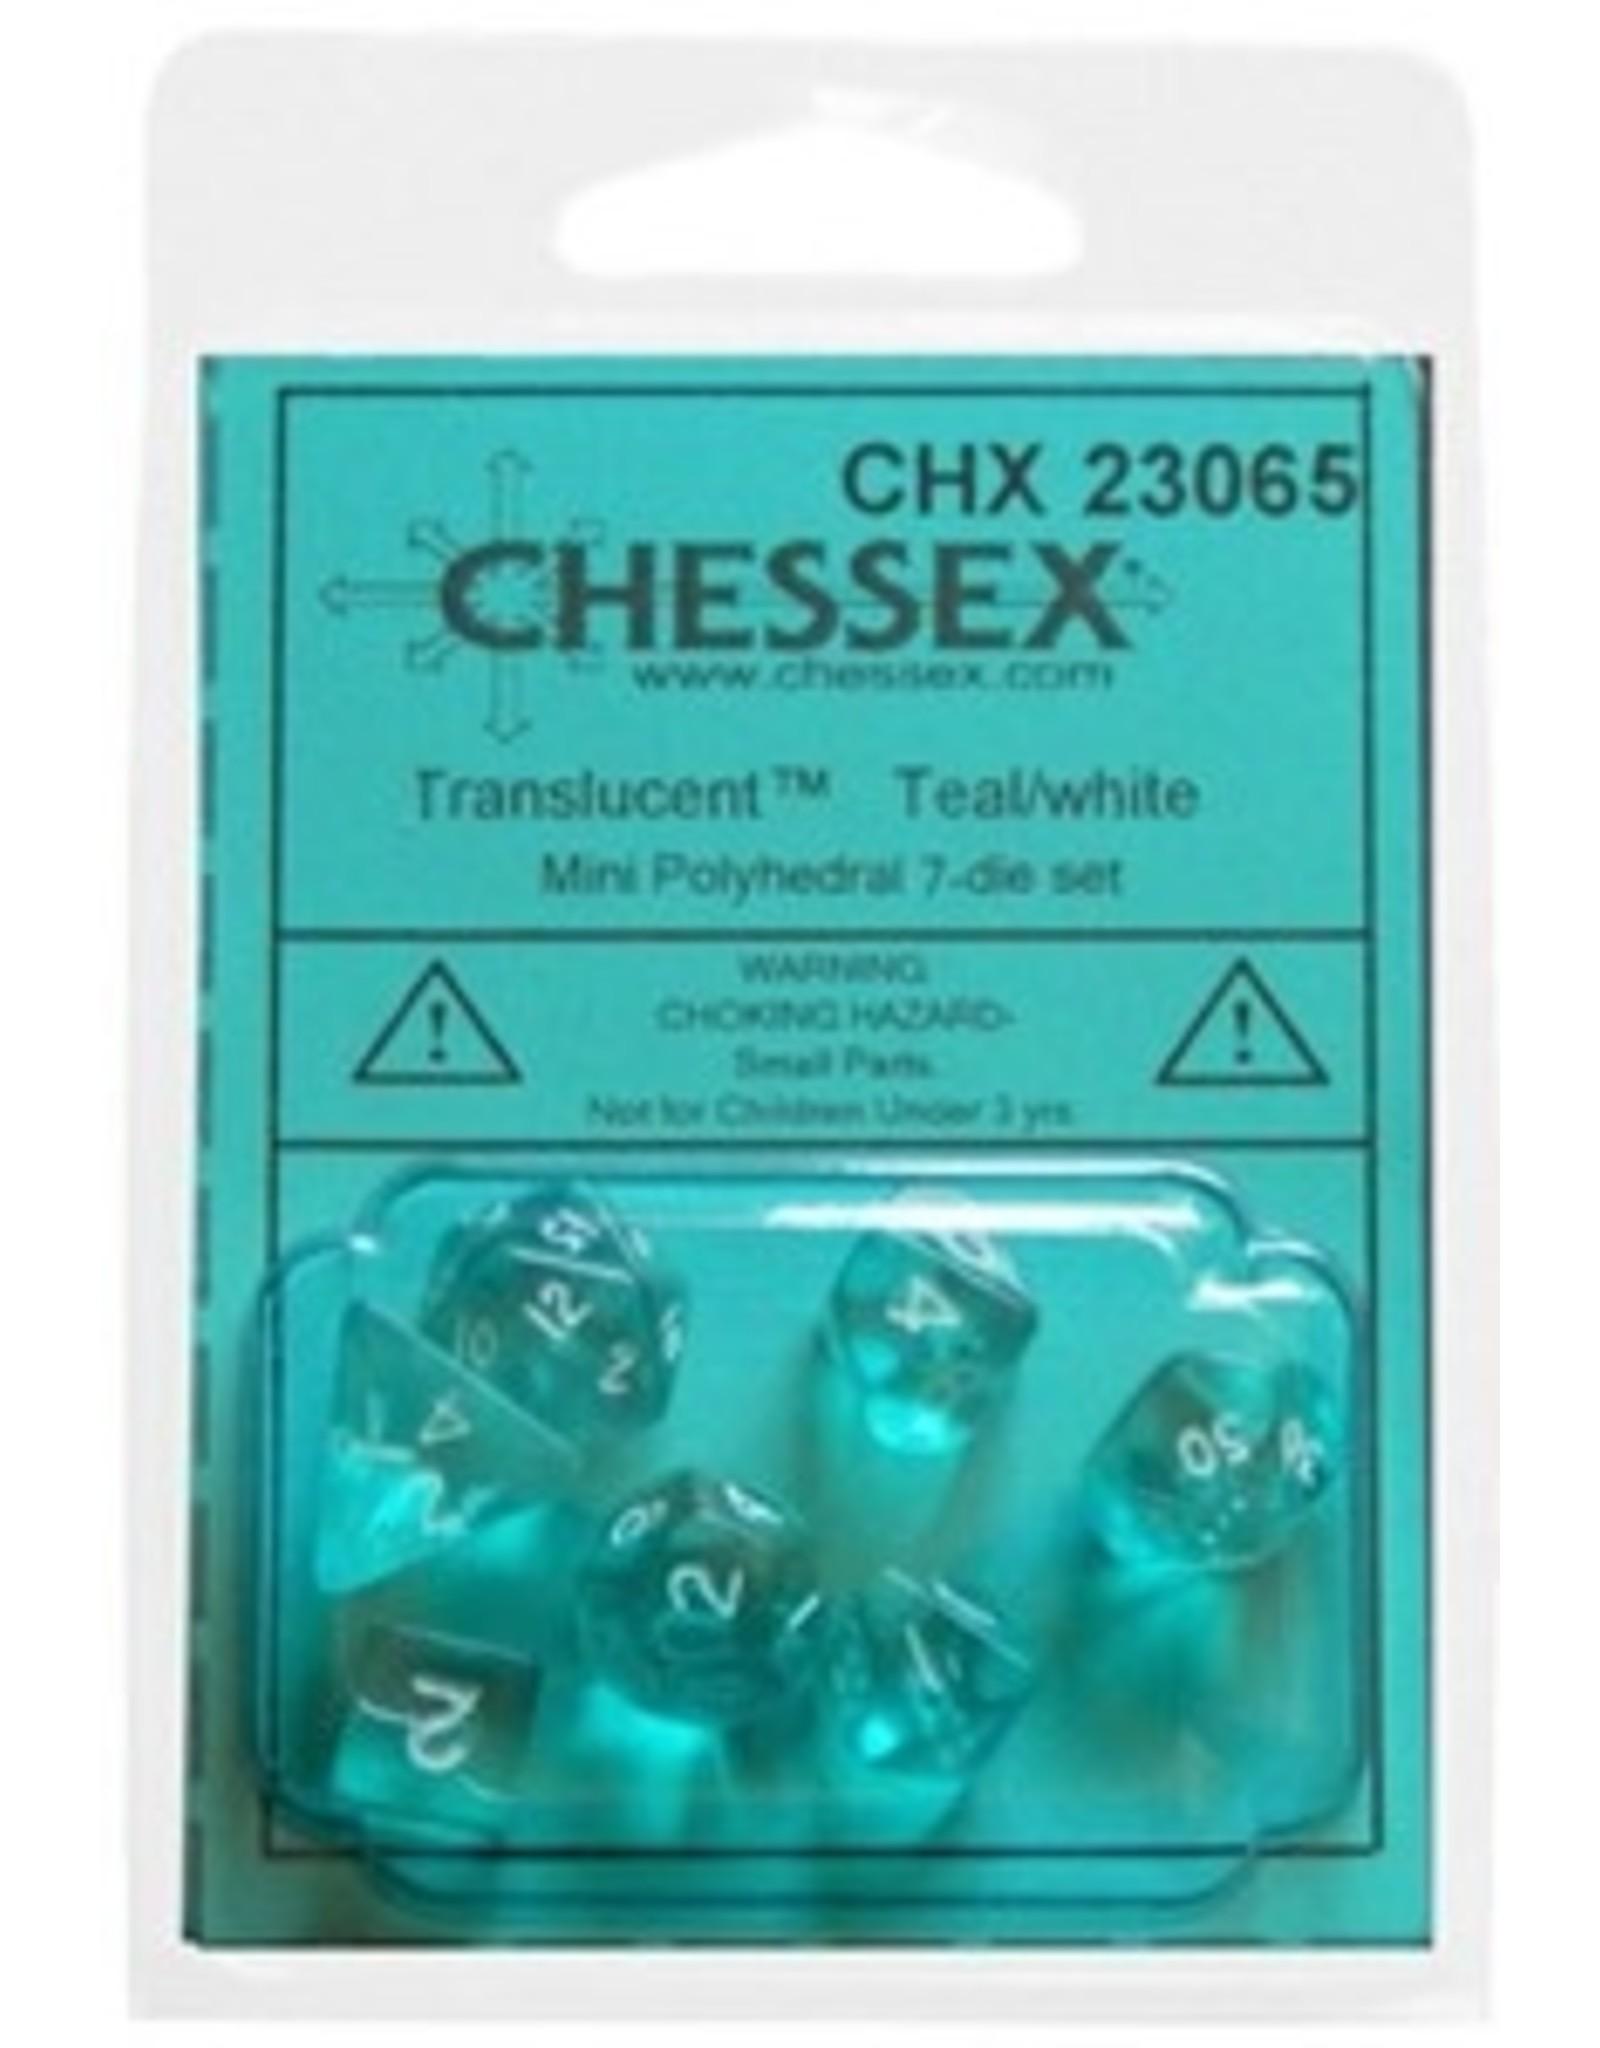 Chessex 7-Set Polyhedral Translucent Mini Teal/White Set